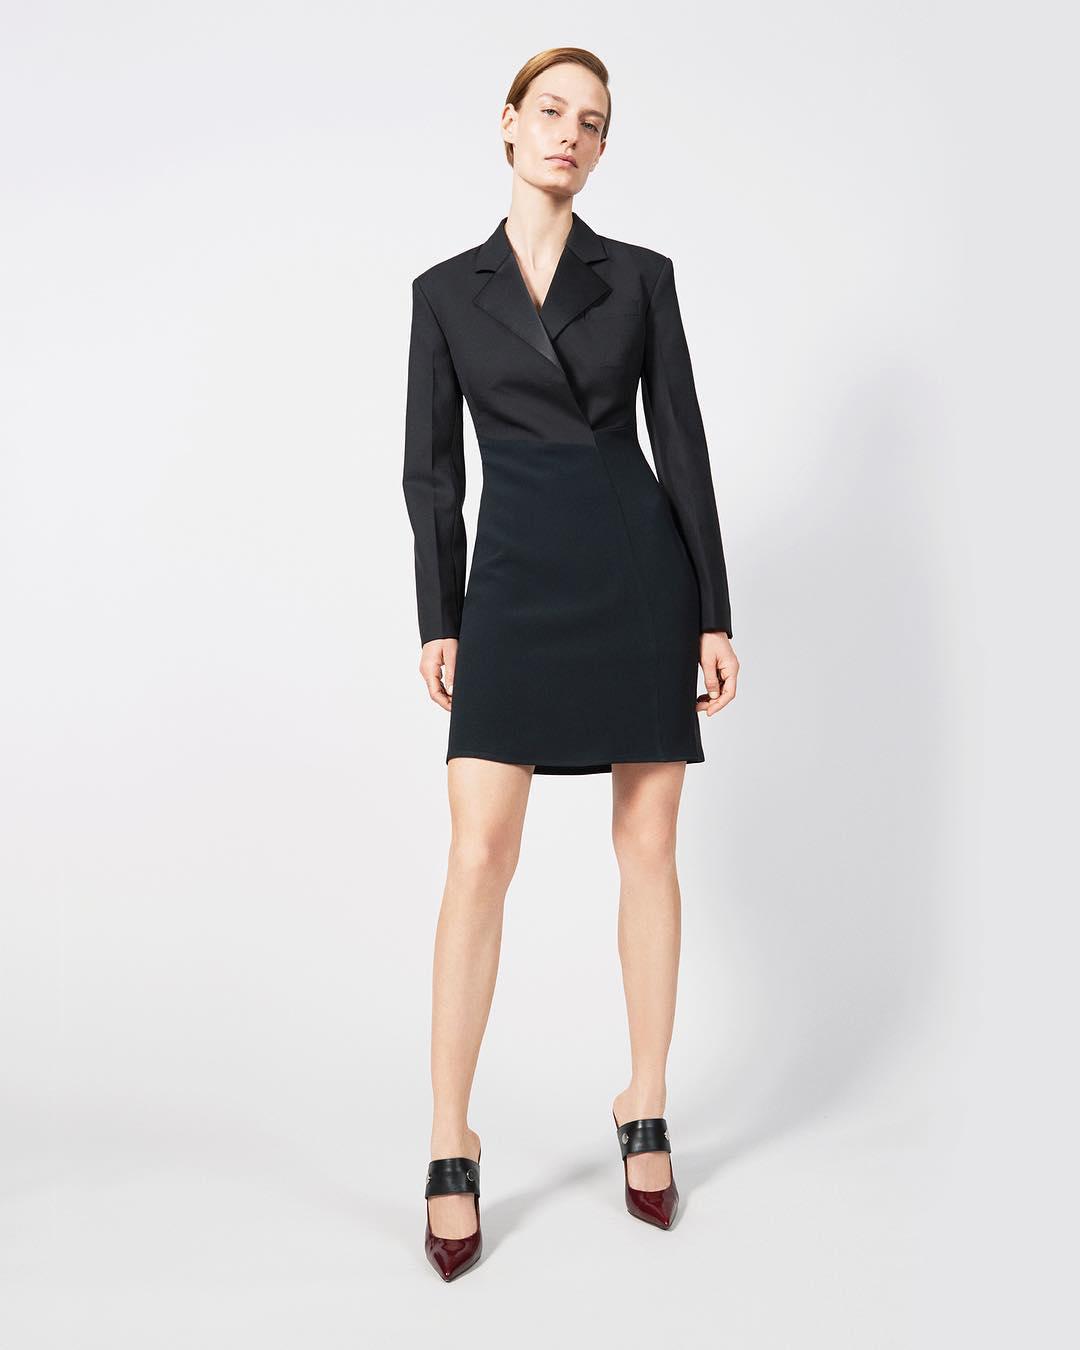 Tailored Tuxedo Dress by Victoria Beckham 2021